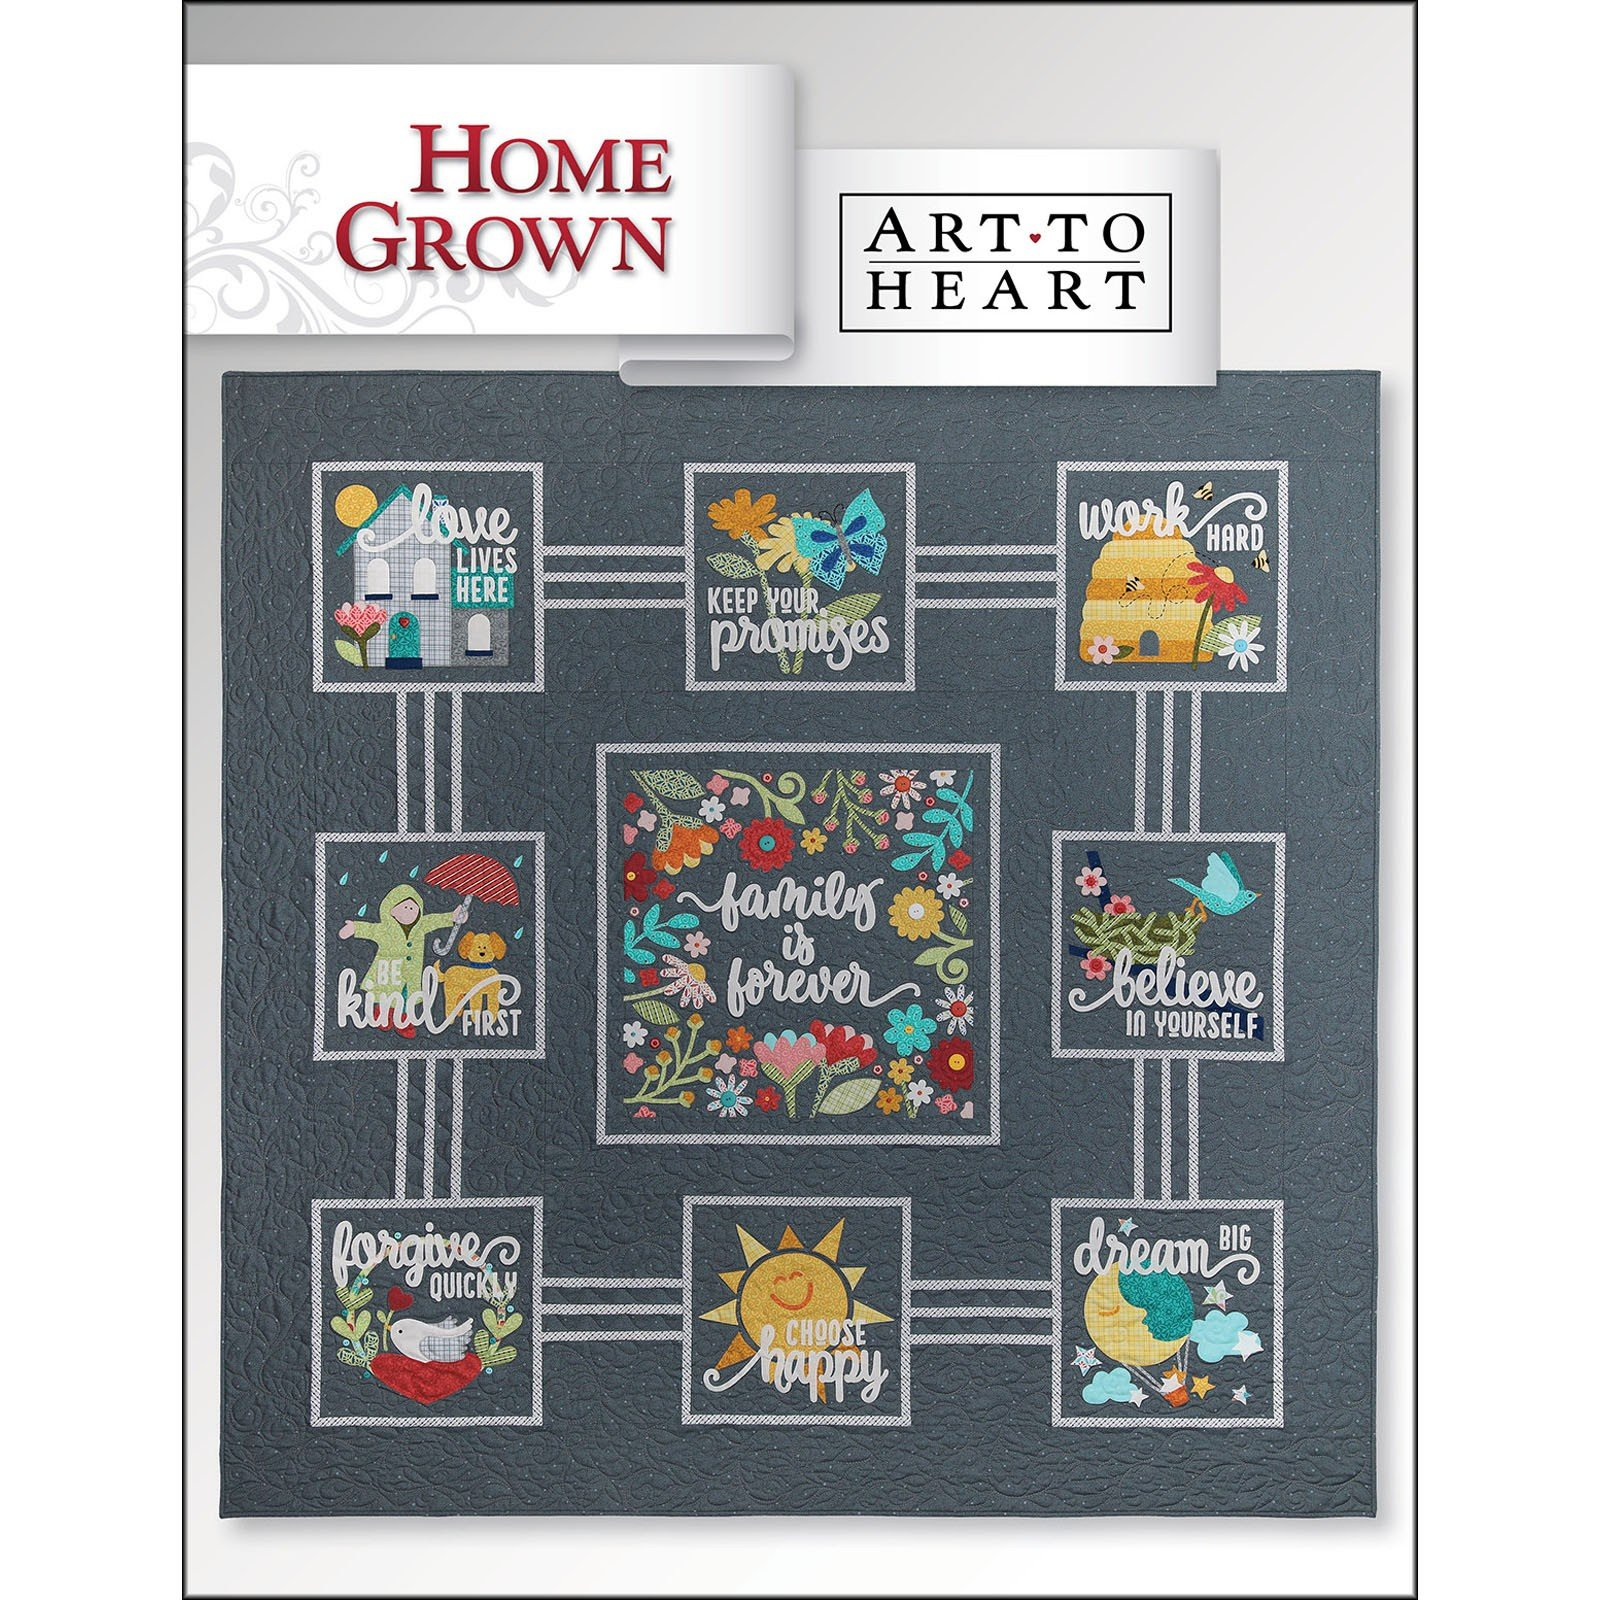 Home Grown by Nancy Halvorsen - ATH553B - Book